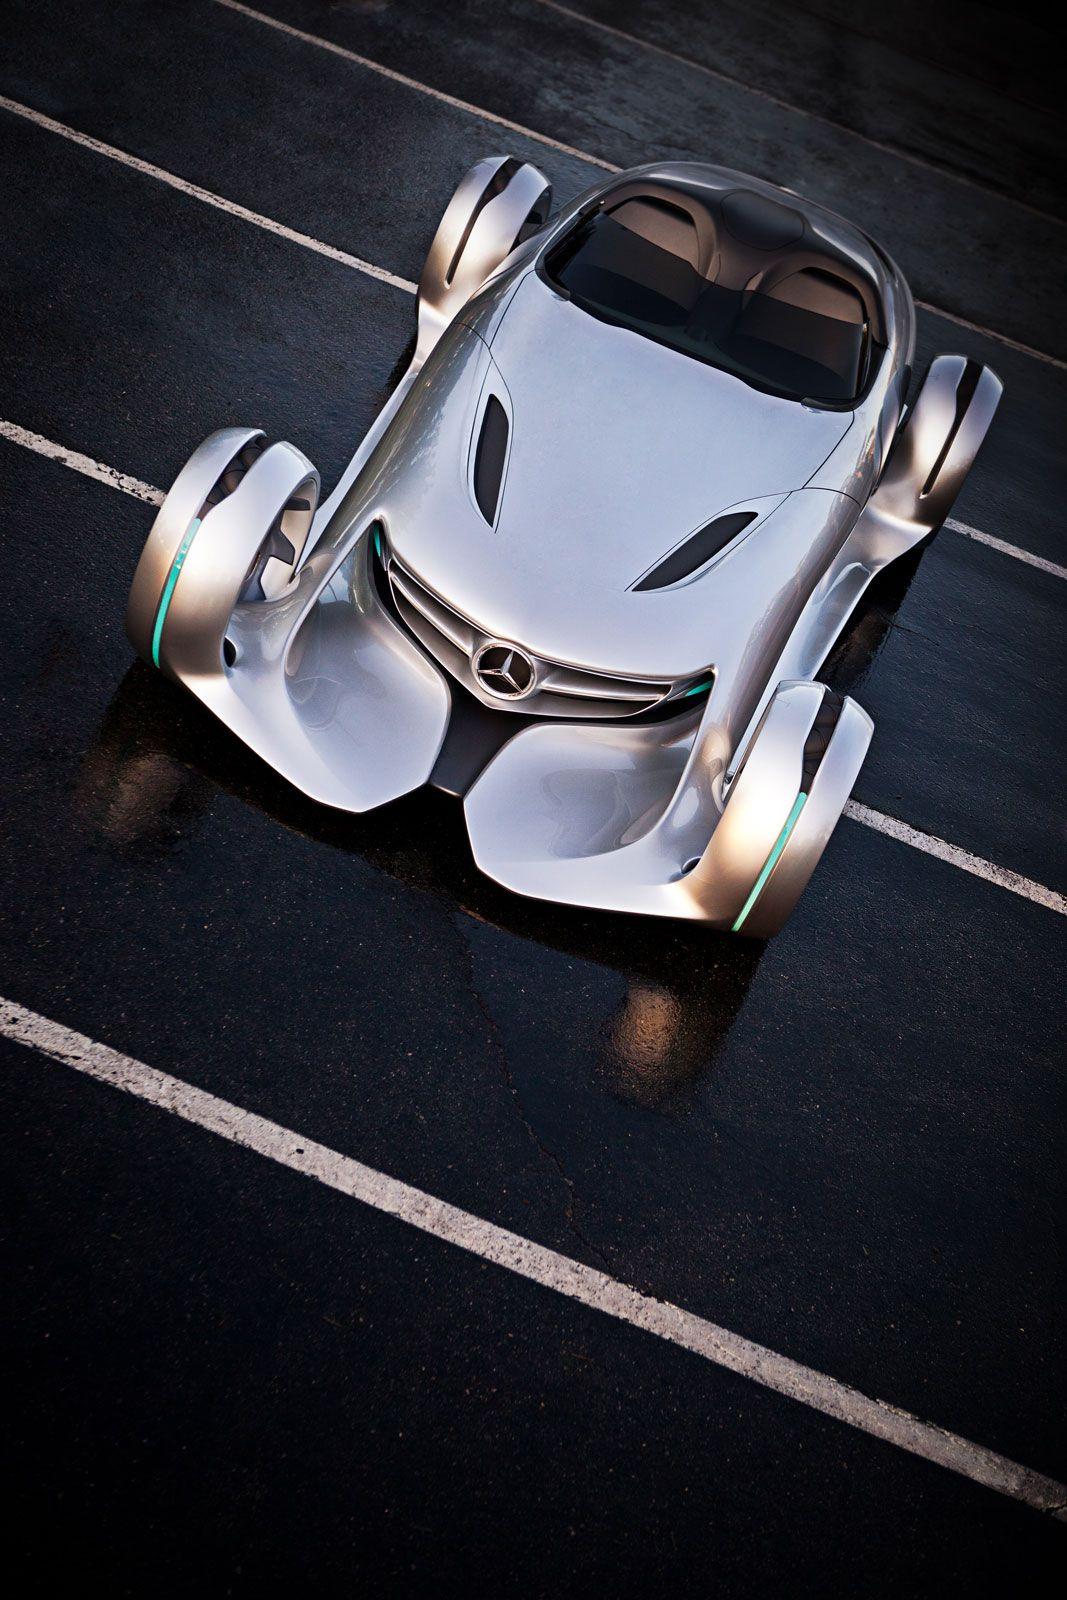 Exceptionnel Mercedes Benz Biome Concept HQ Wallpaper | Lugares Para Visitar | Pinterest  | Mercedes Benz Biome, Biomes And Mercedes Benz